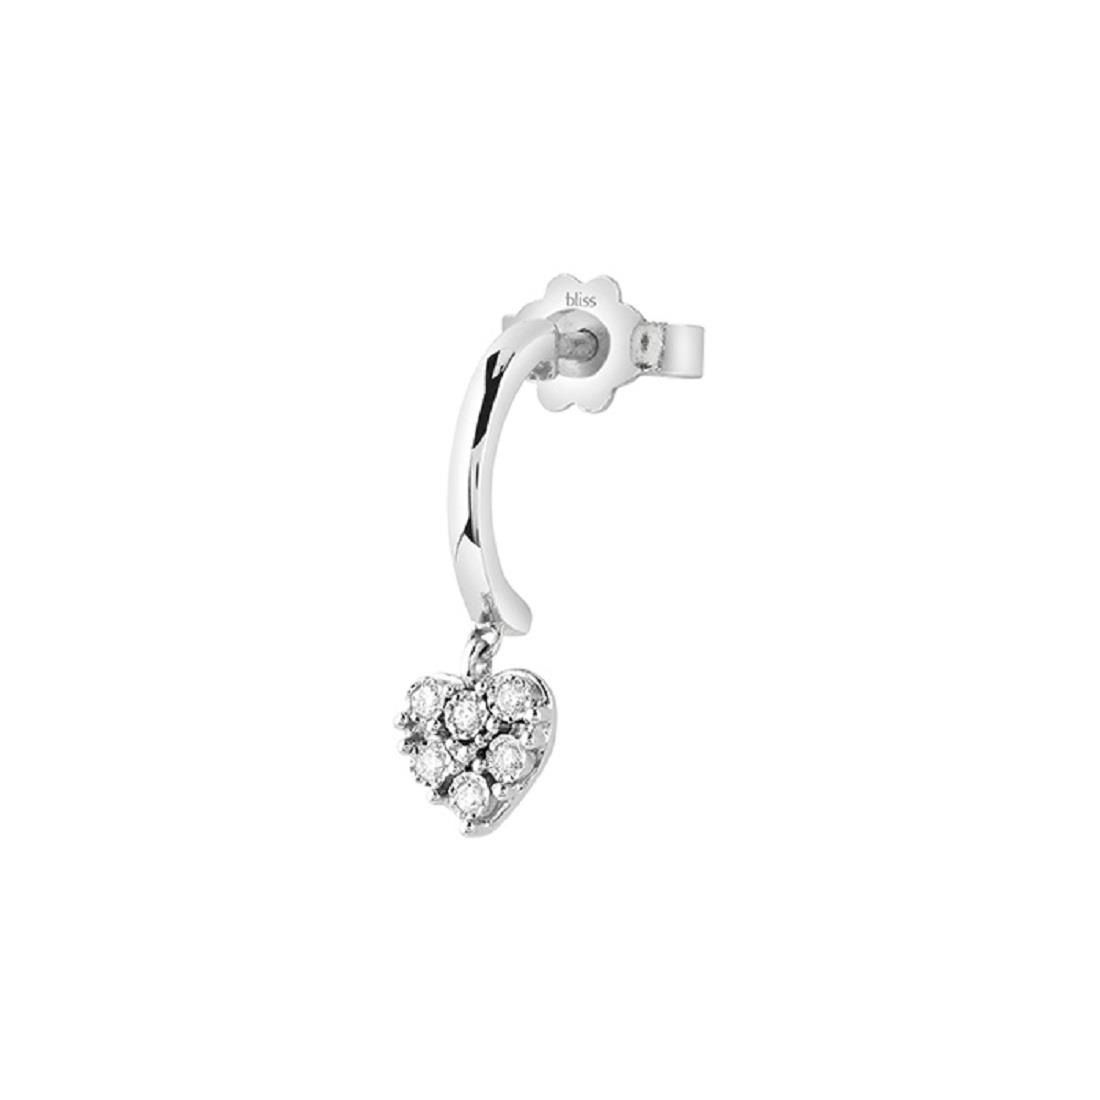 Mono orecchino con diamanti - BLISS